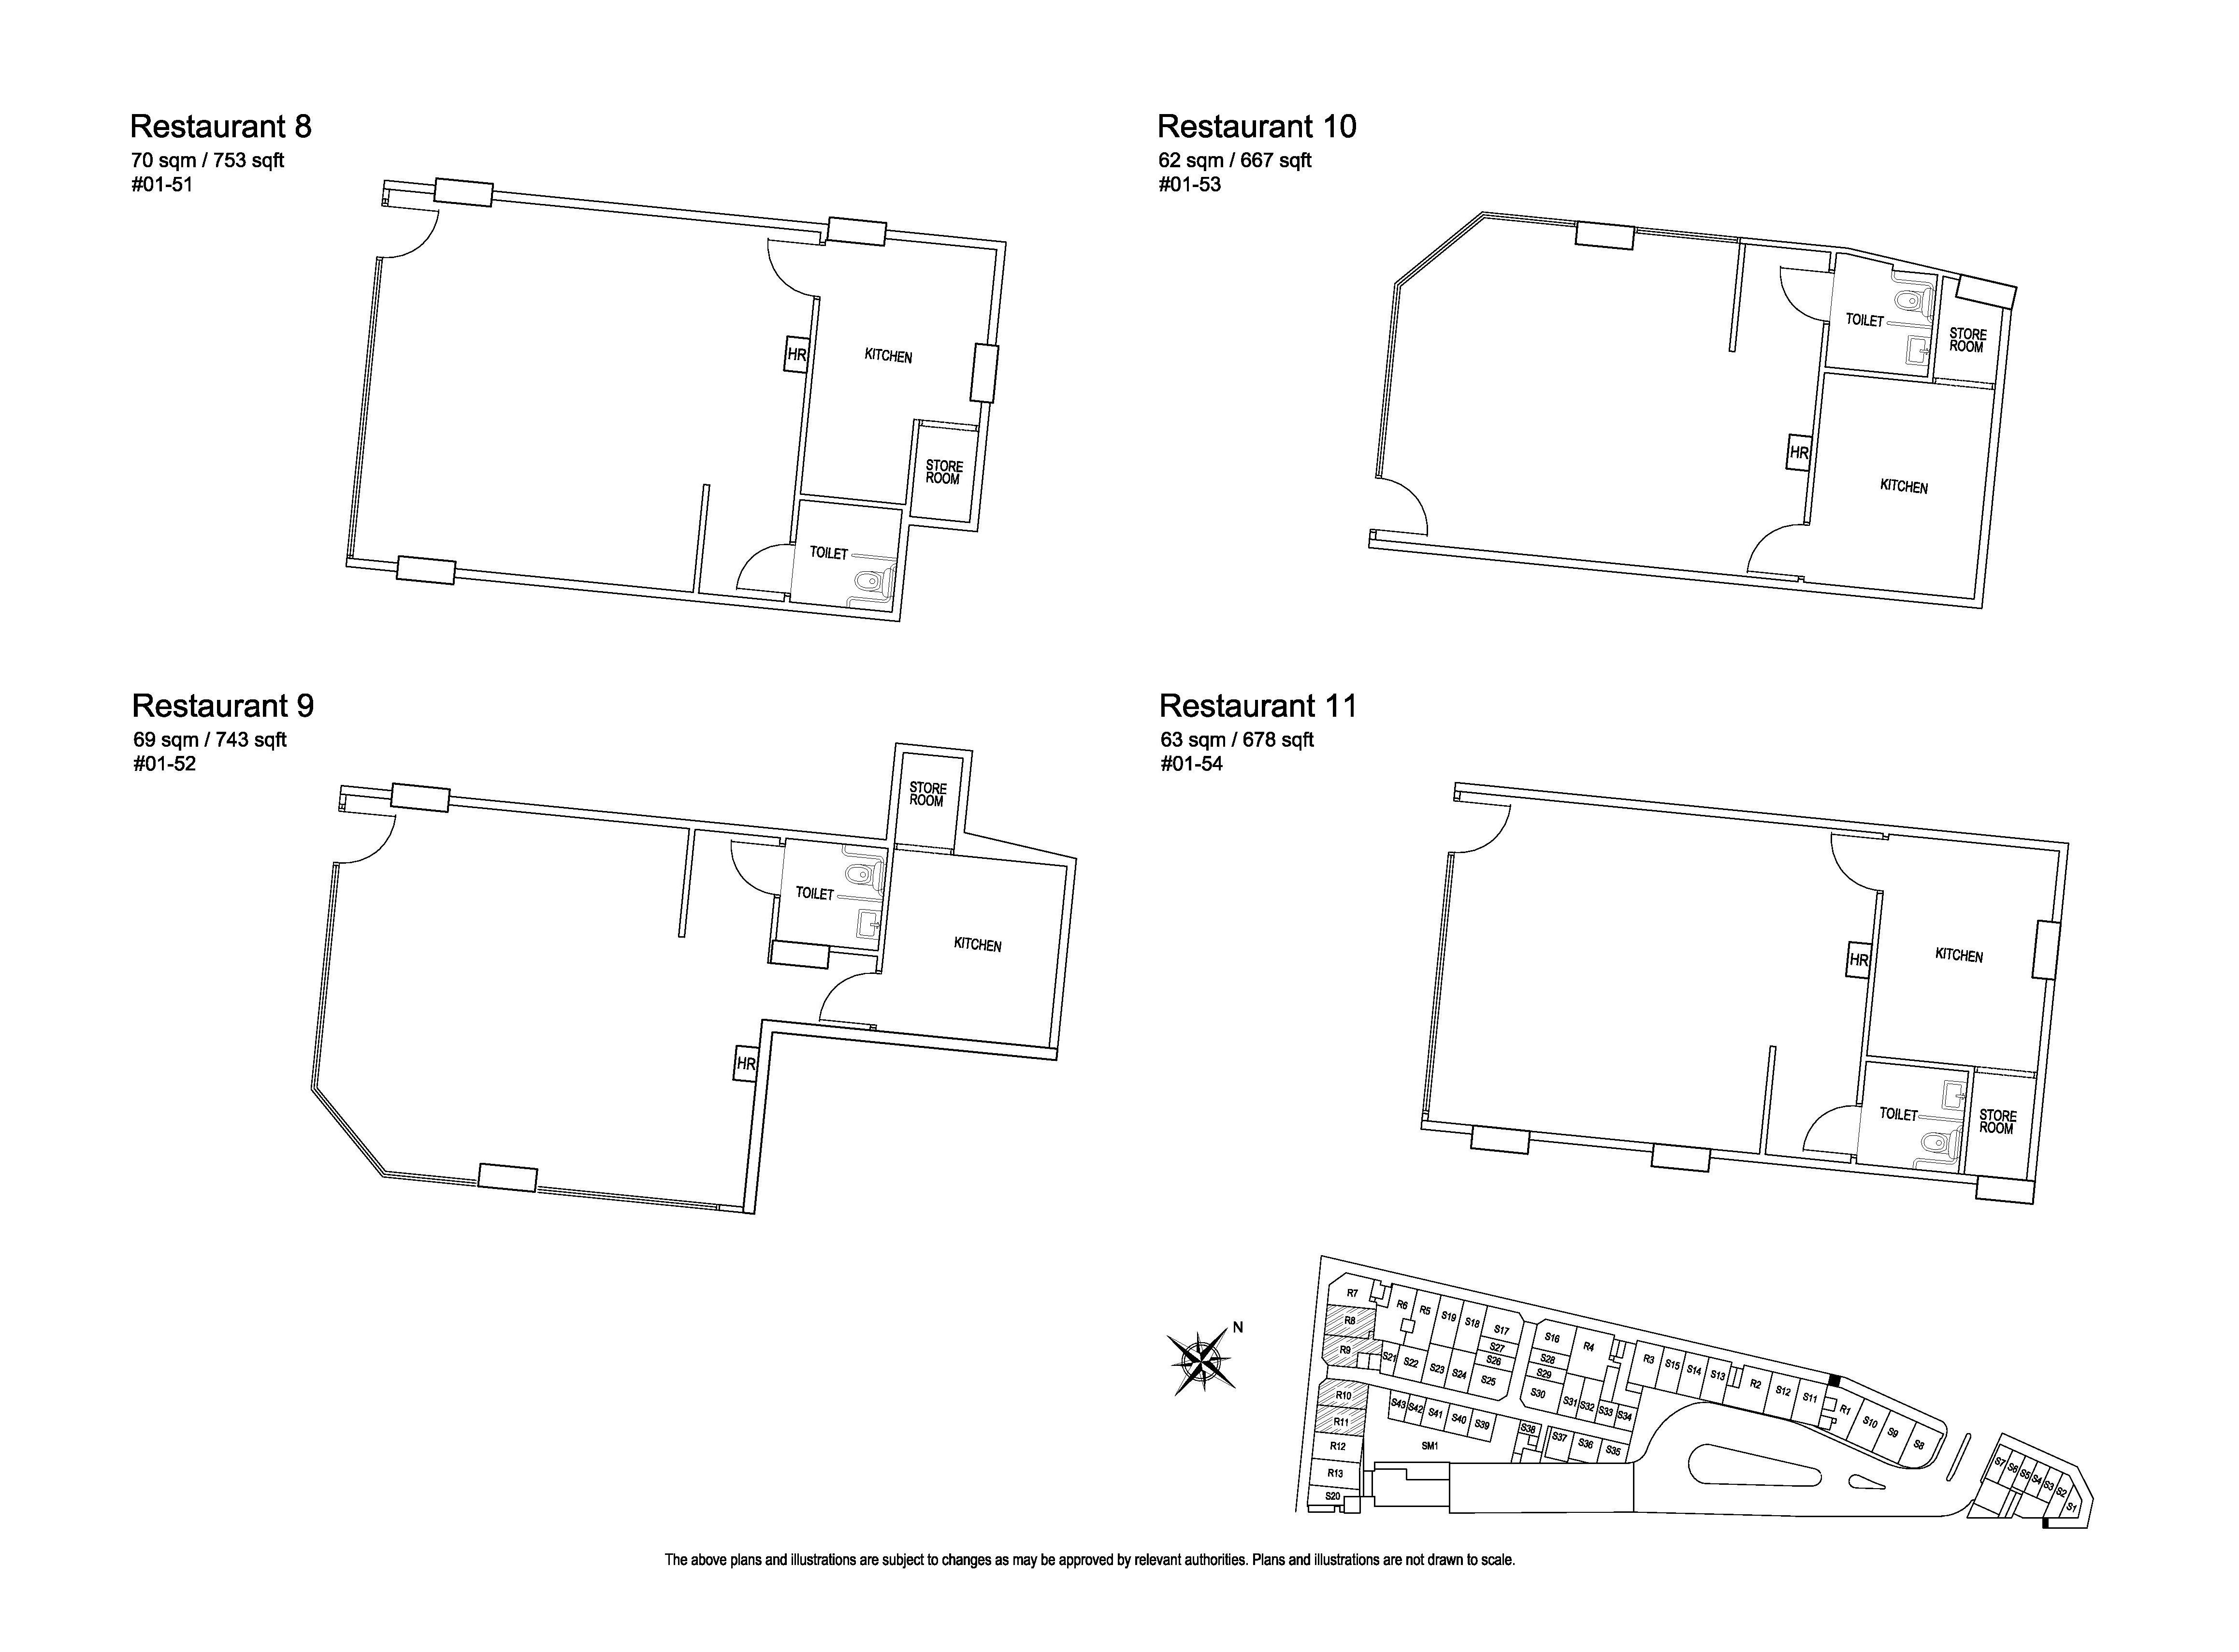 Kensington Square Restaurant 8,9,10,11 Floor Plans